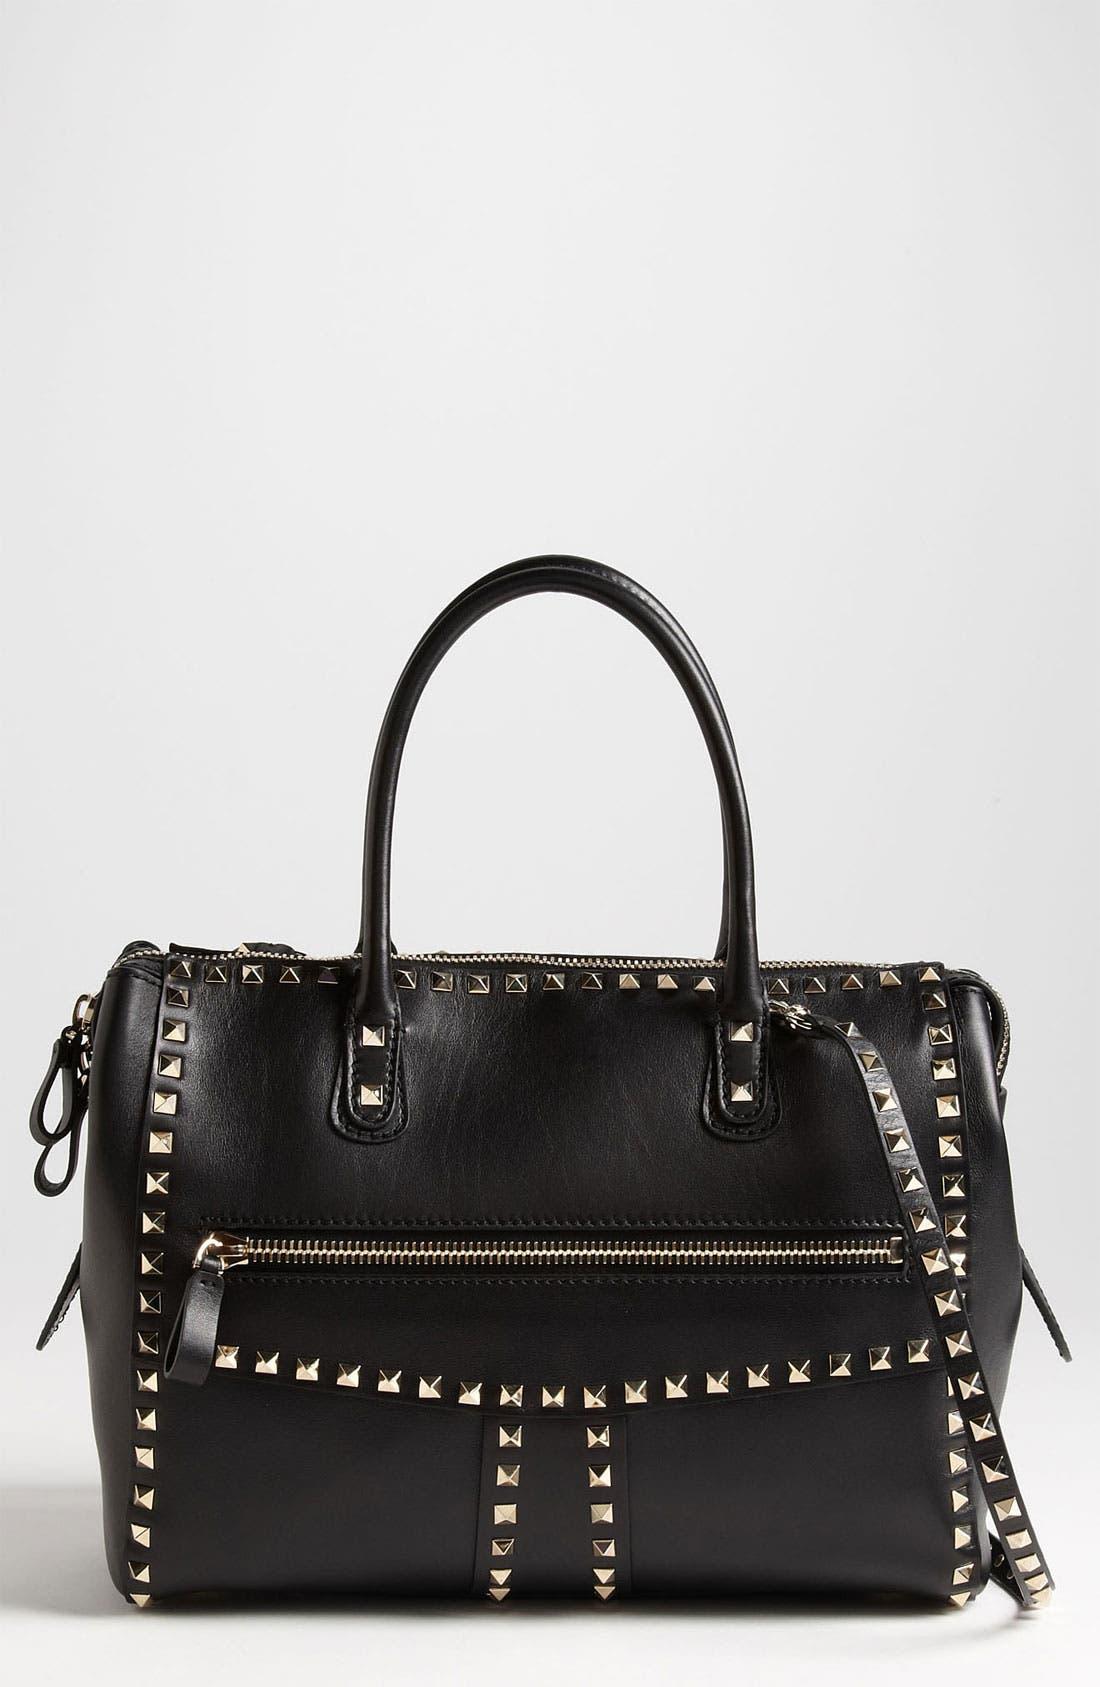 Alternate Image 1 Selected - Valentino 'Rockstud - Small' Leather Handbag